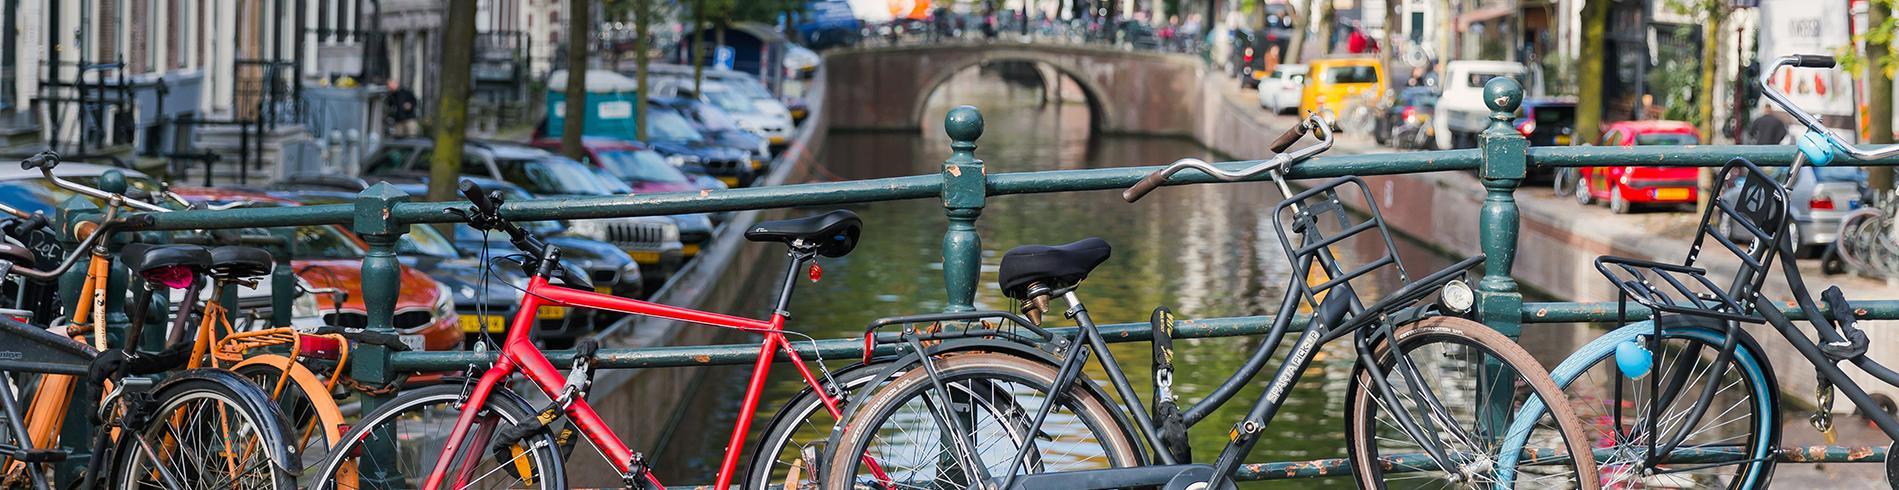 Visit Amsterdam with Eurostar